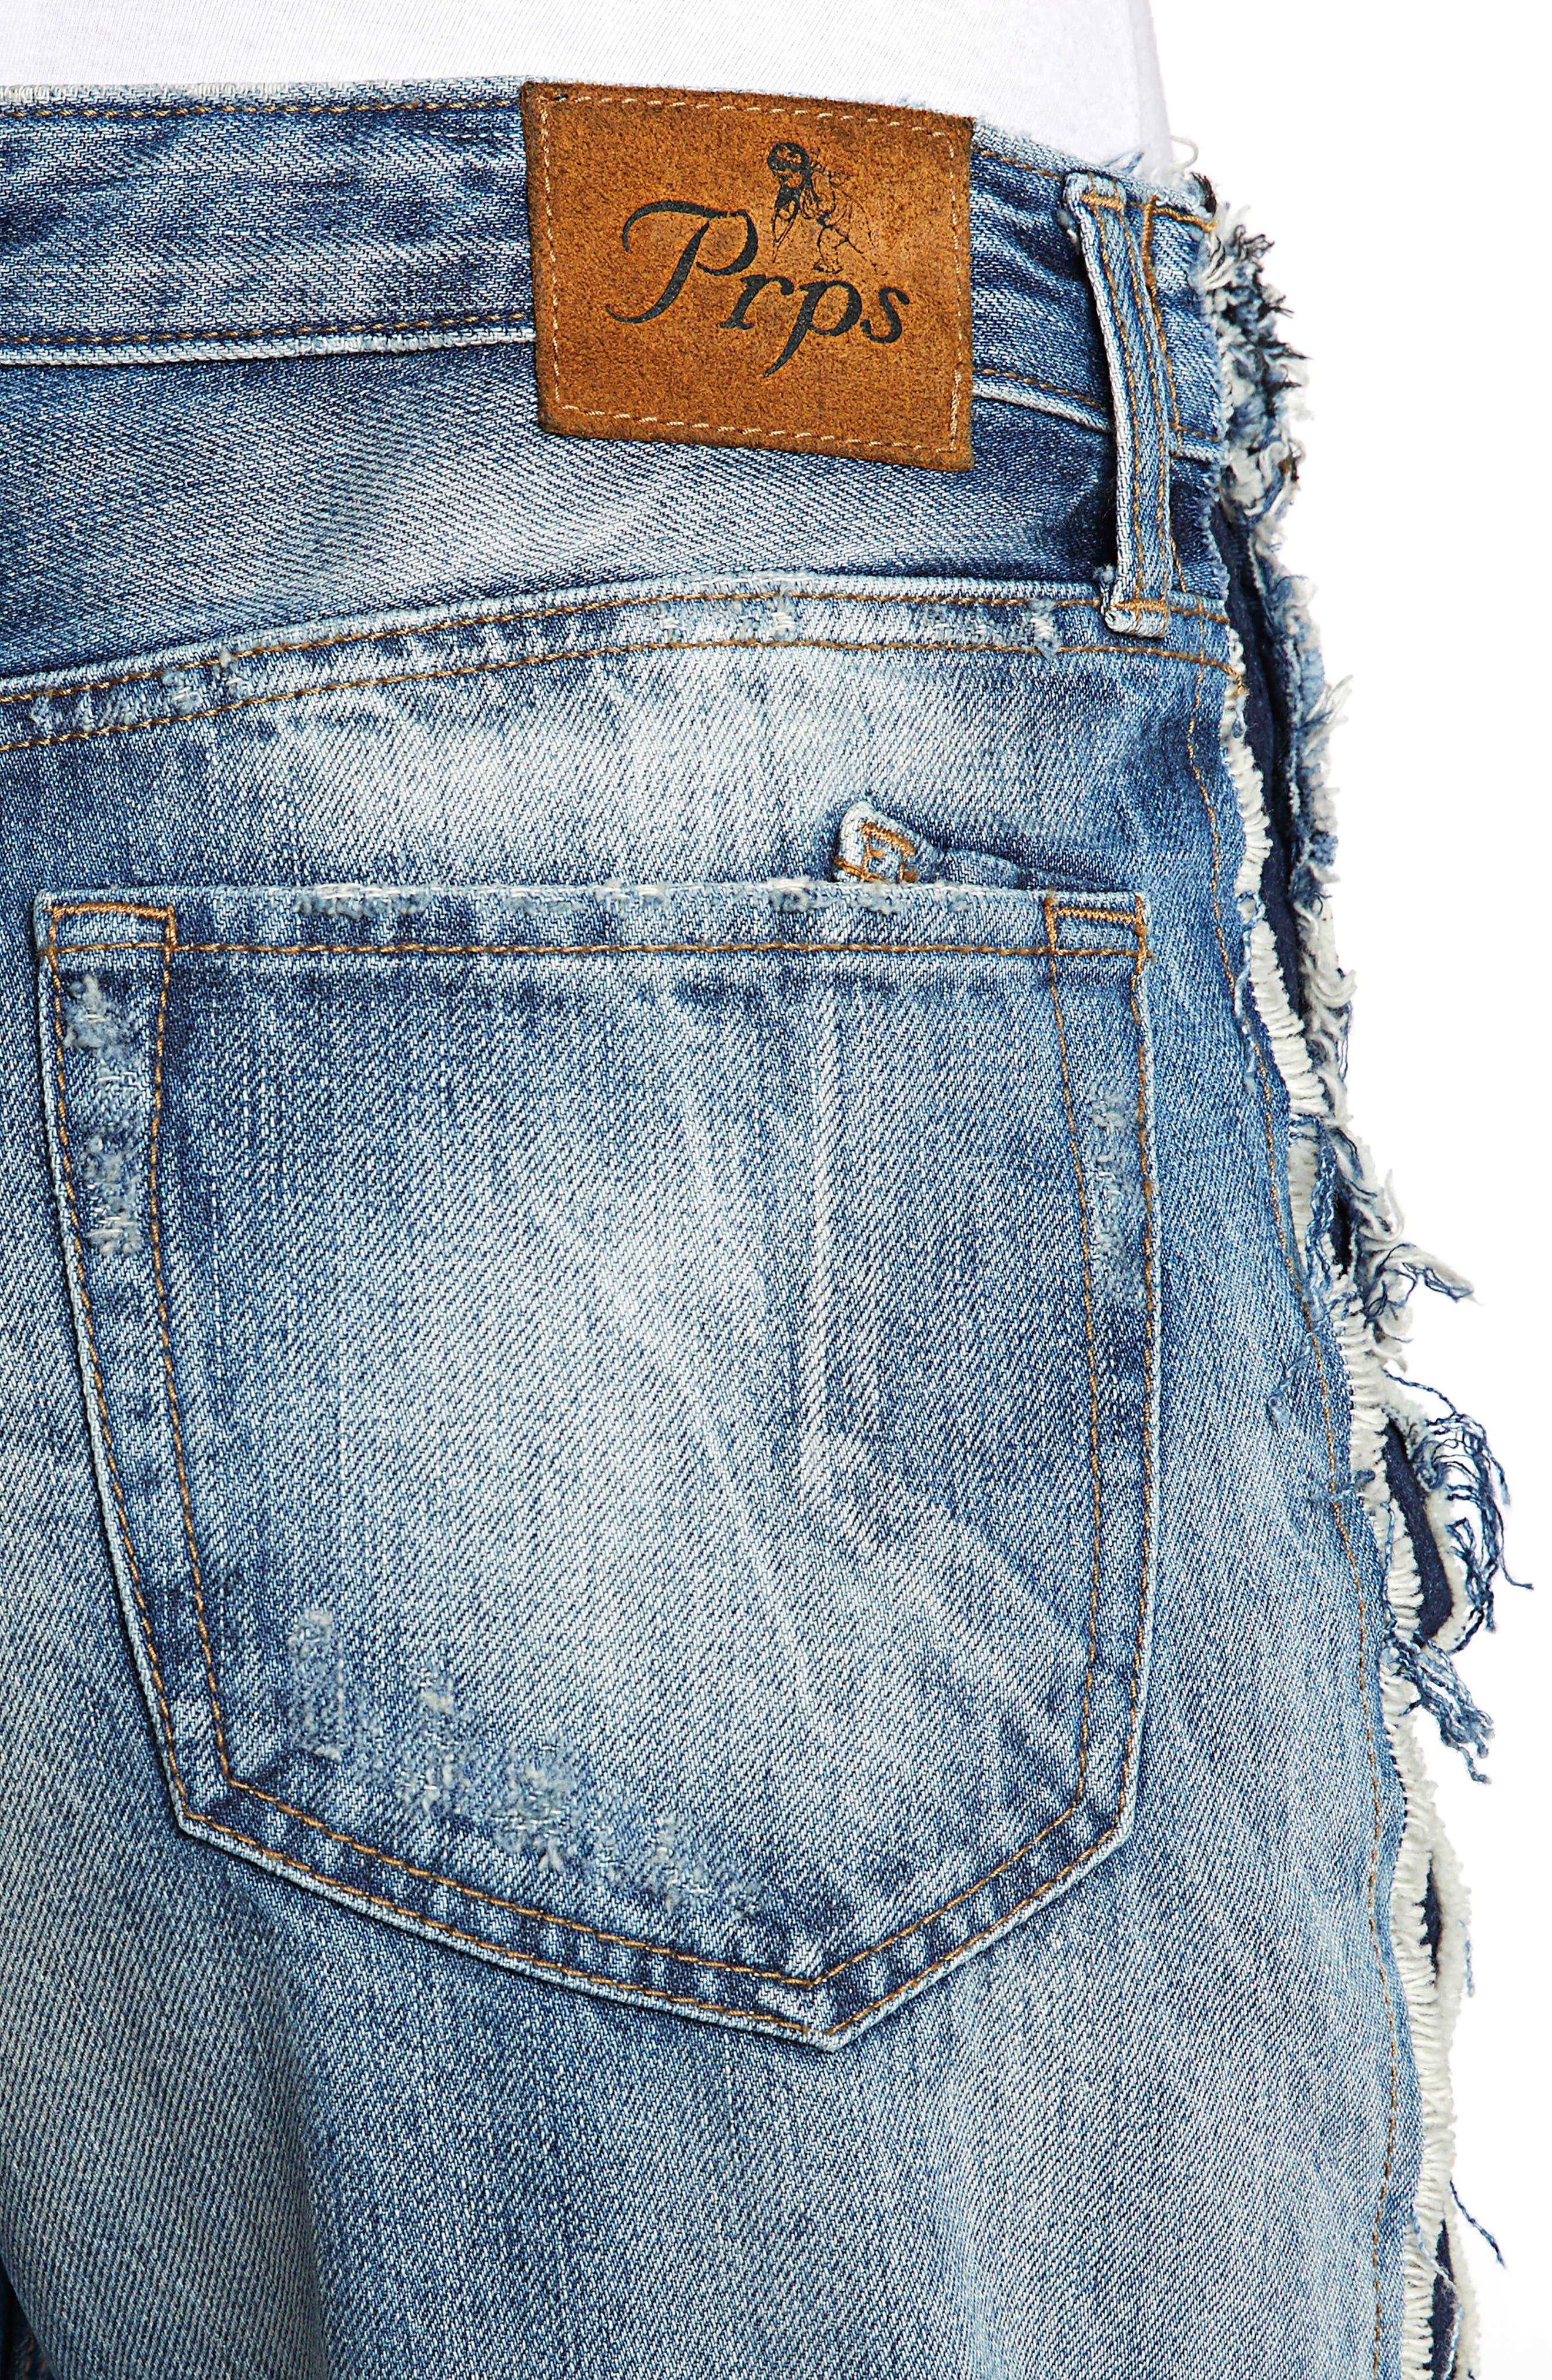 Bel Air High Waist Contrast Seam Boyfriend Jeans,                             Alternate thumbnail 4, color,                             490